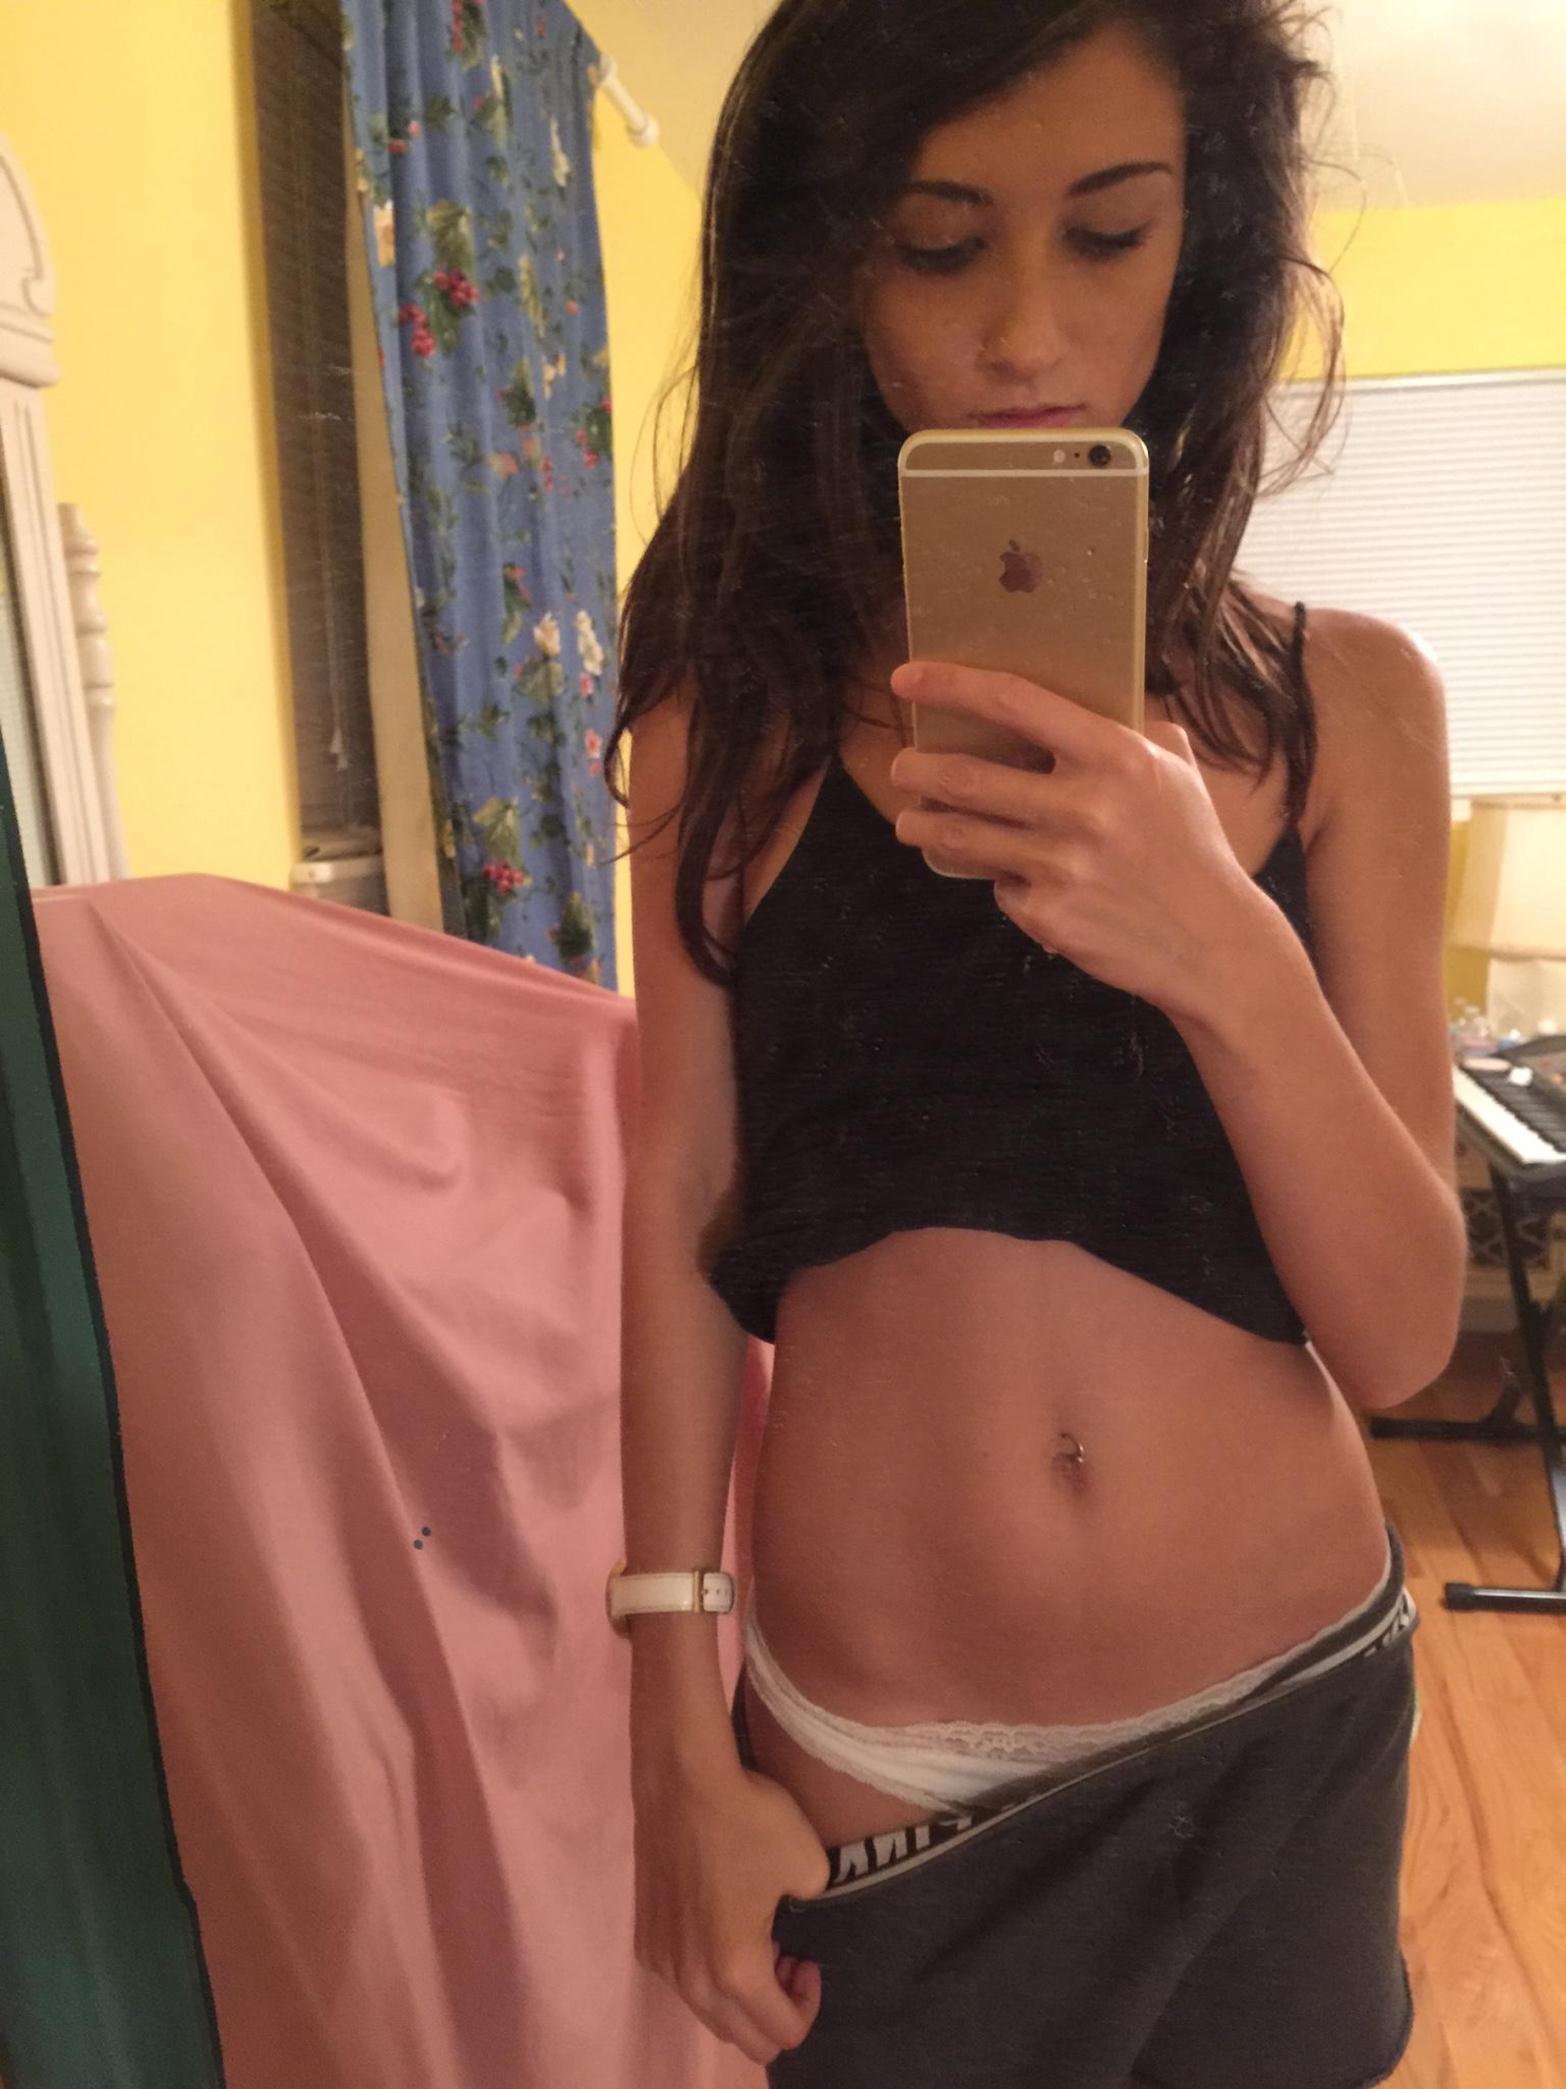 slim-body-amateur-girl-selfie-pics-mirror-nude-01